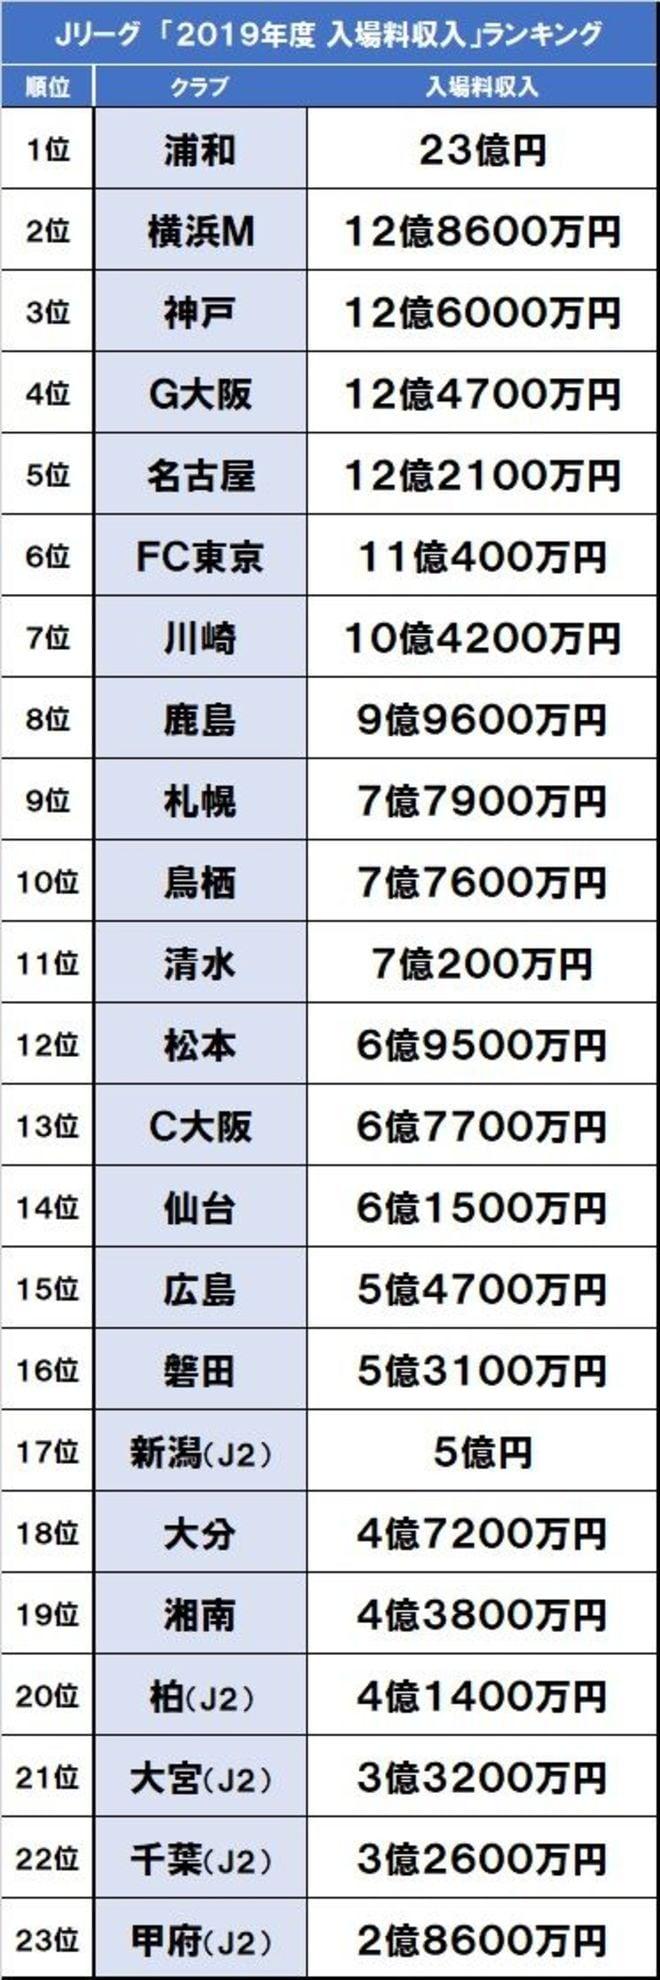 J1ベガルタ仙台「債務超過報道」を考える(1)Jクラブの「スポンサー収入」「入場料収入」「人件費」分析の画像001